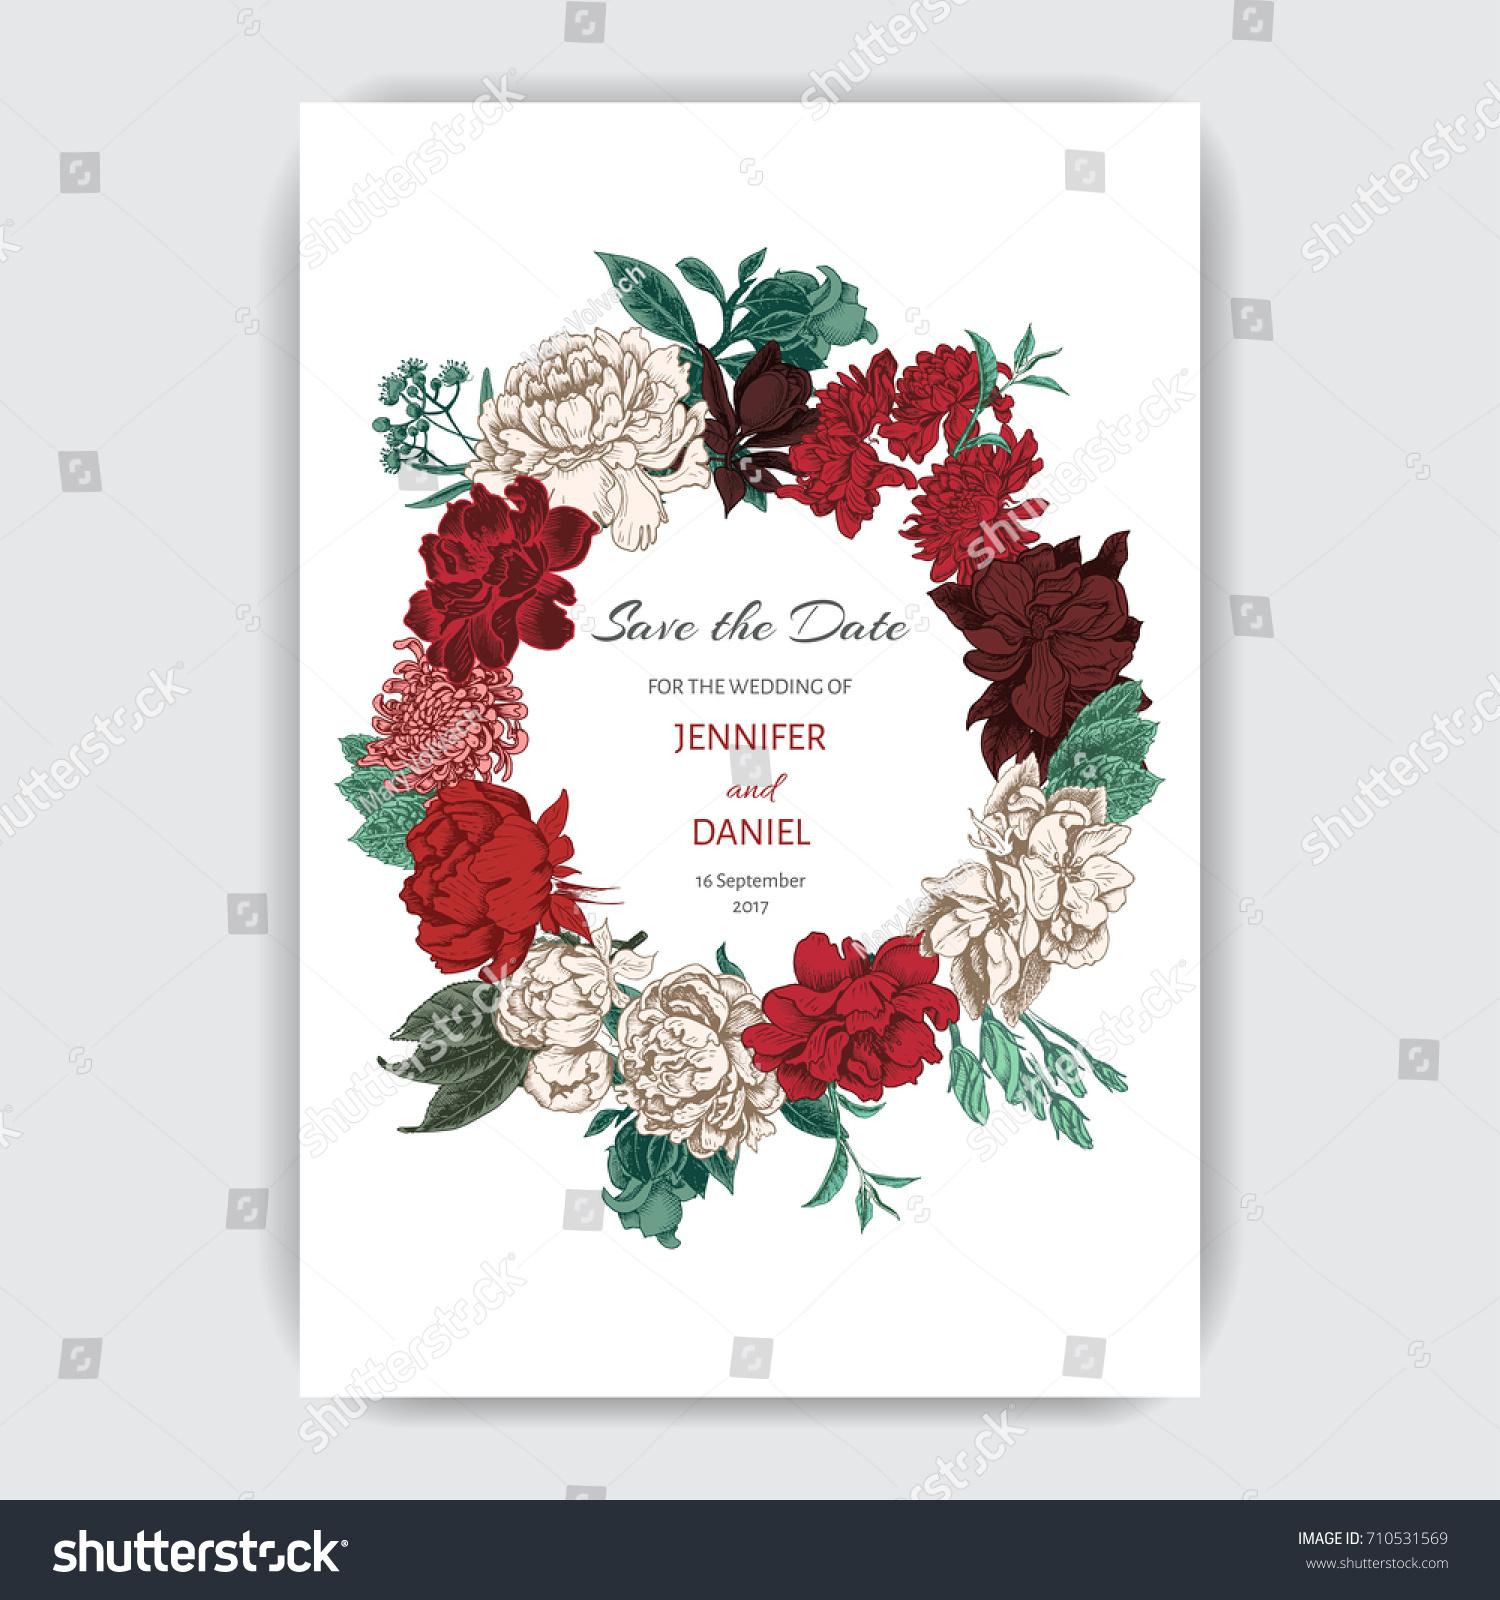 Vector Illustration Sketch Card Flowers Chrysanthemum Stock Vector ...